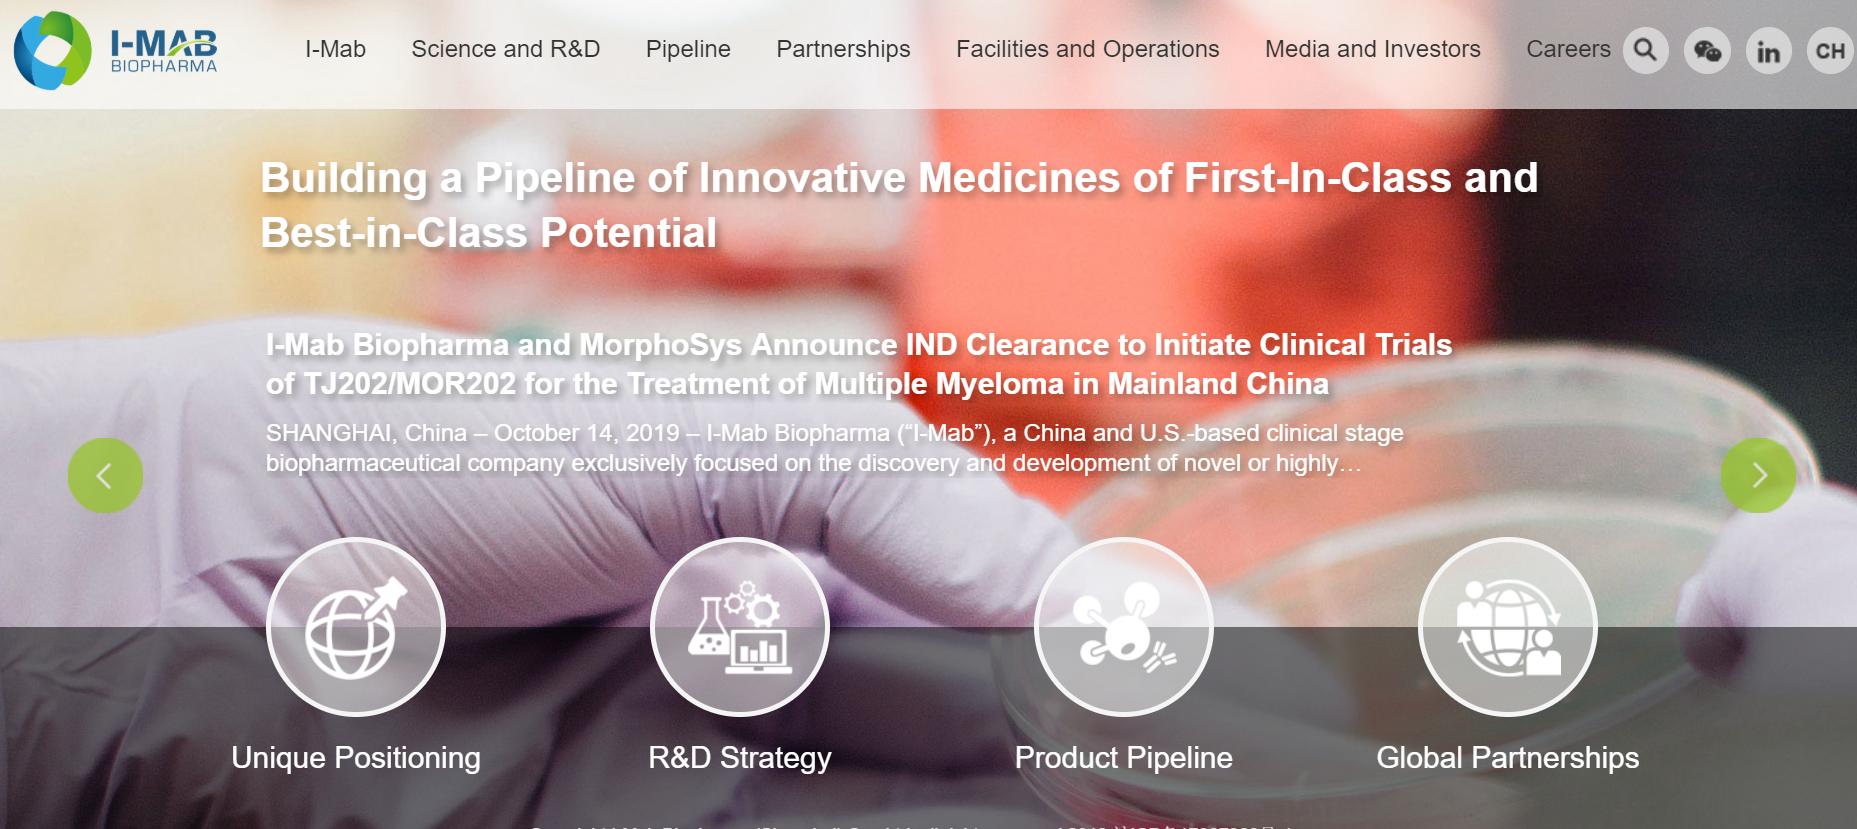 Biopharma Developer I-Mab Applies for $100 Million U.S. IPO